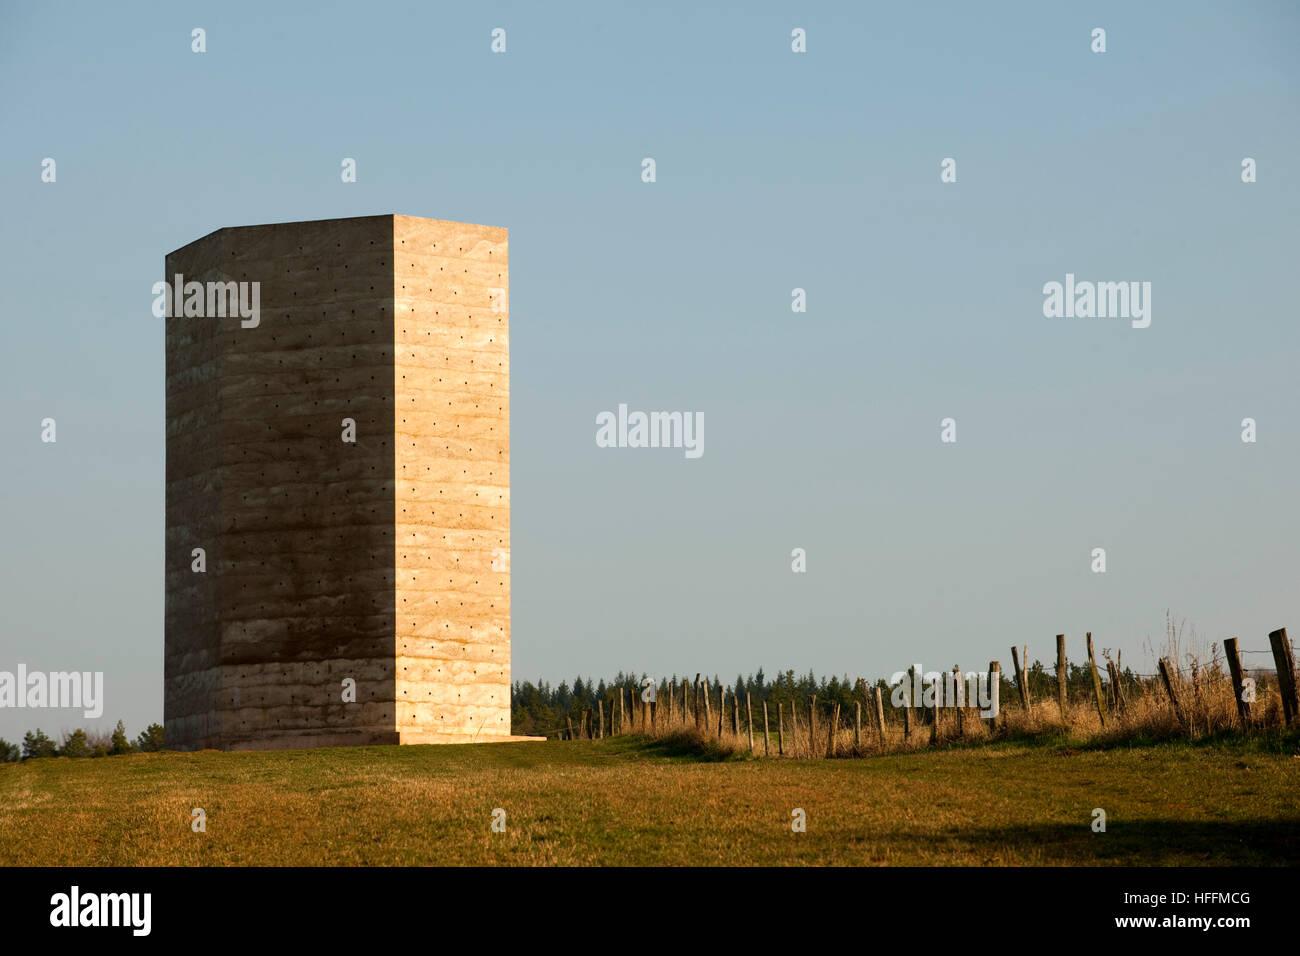 Zumthor stock photos zumthor stock images alamy - Architekt euskirchen ...